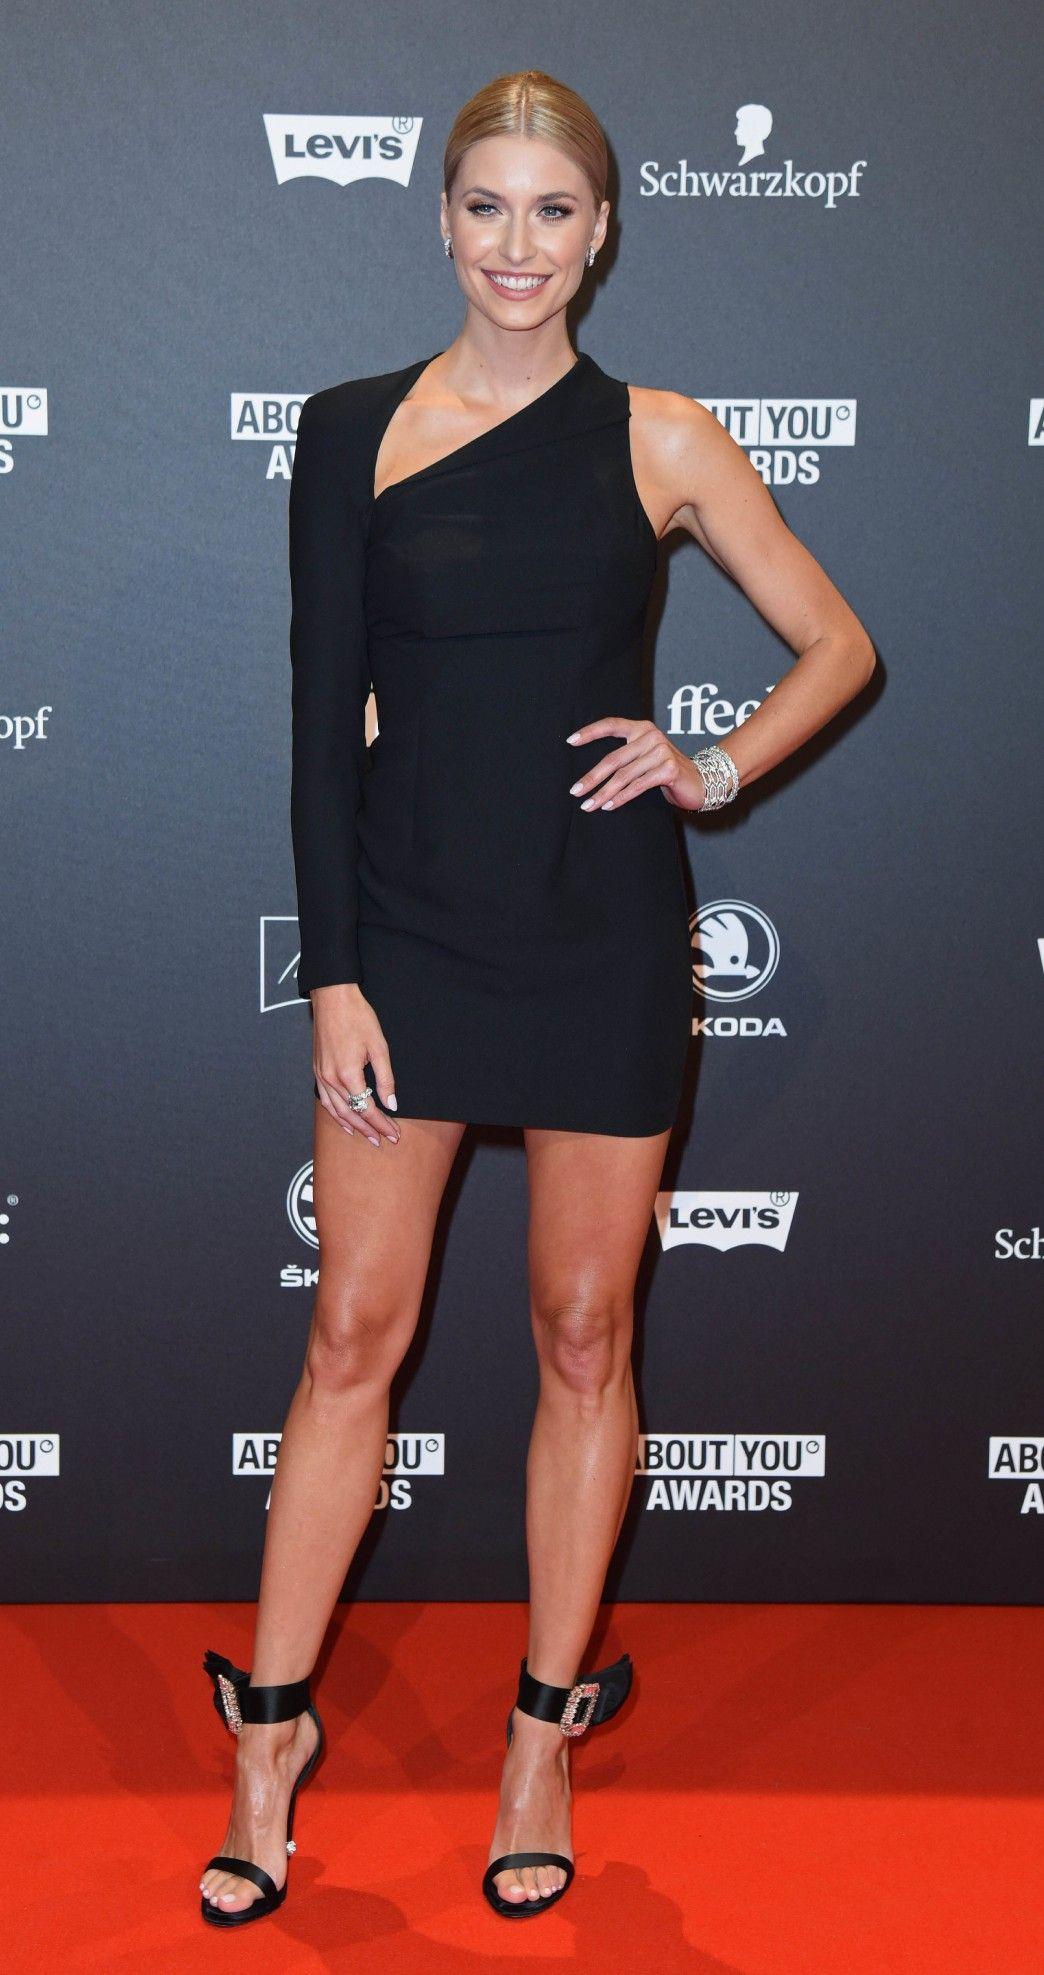 Lena-Gercke | Lena gercke, Berühmte models, Lena